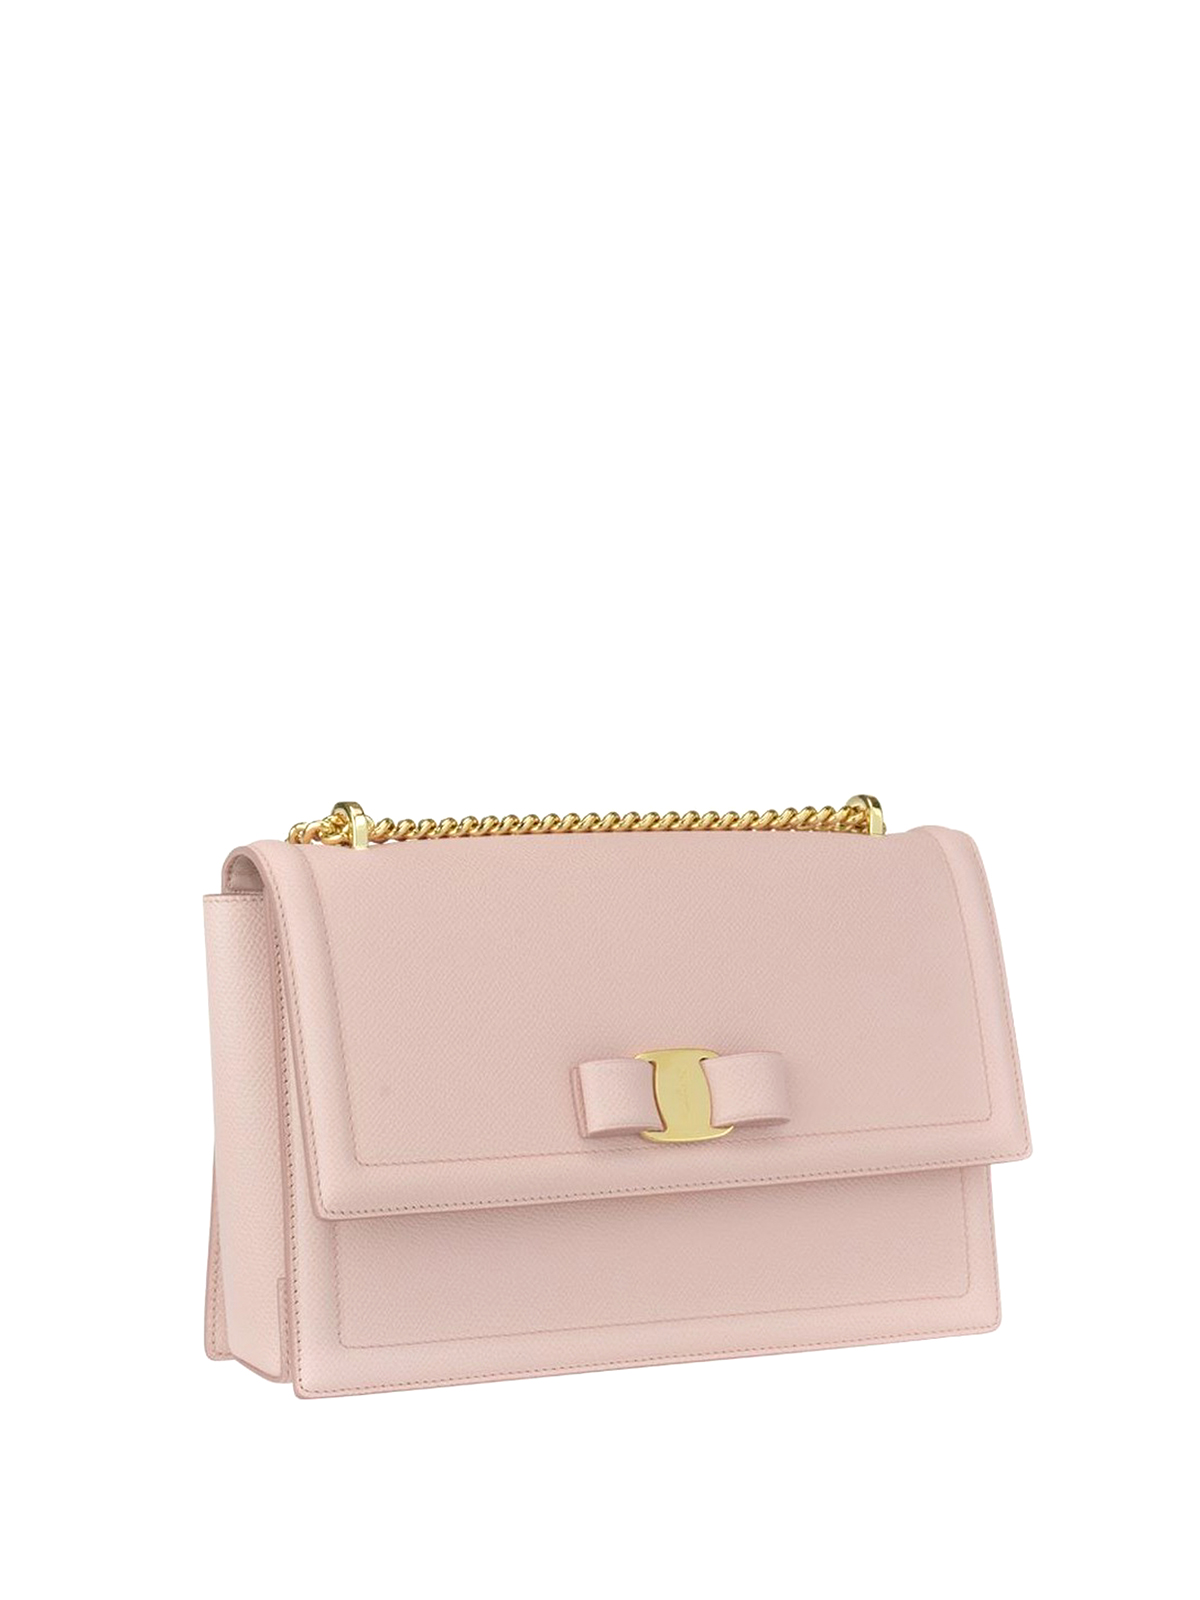 293aaa671094 SALVATORE FERRAGAMO  cross body bags online - Ginny light pink leather bag